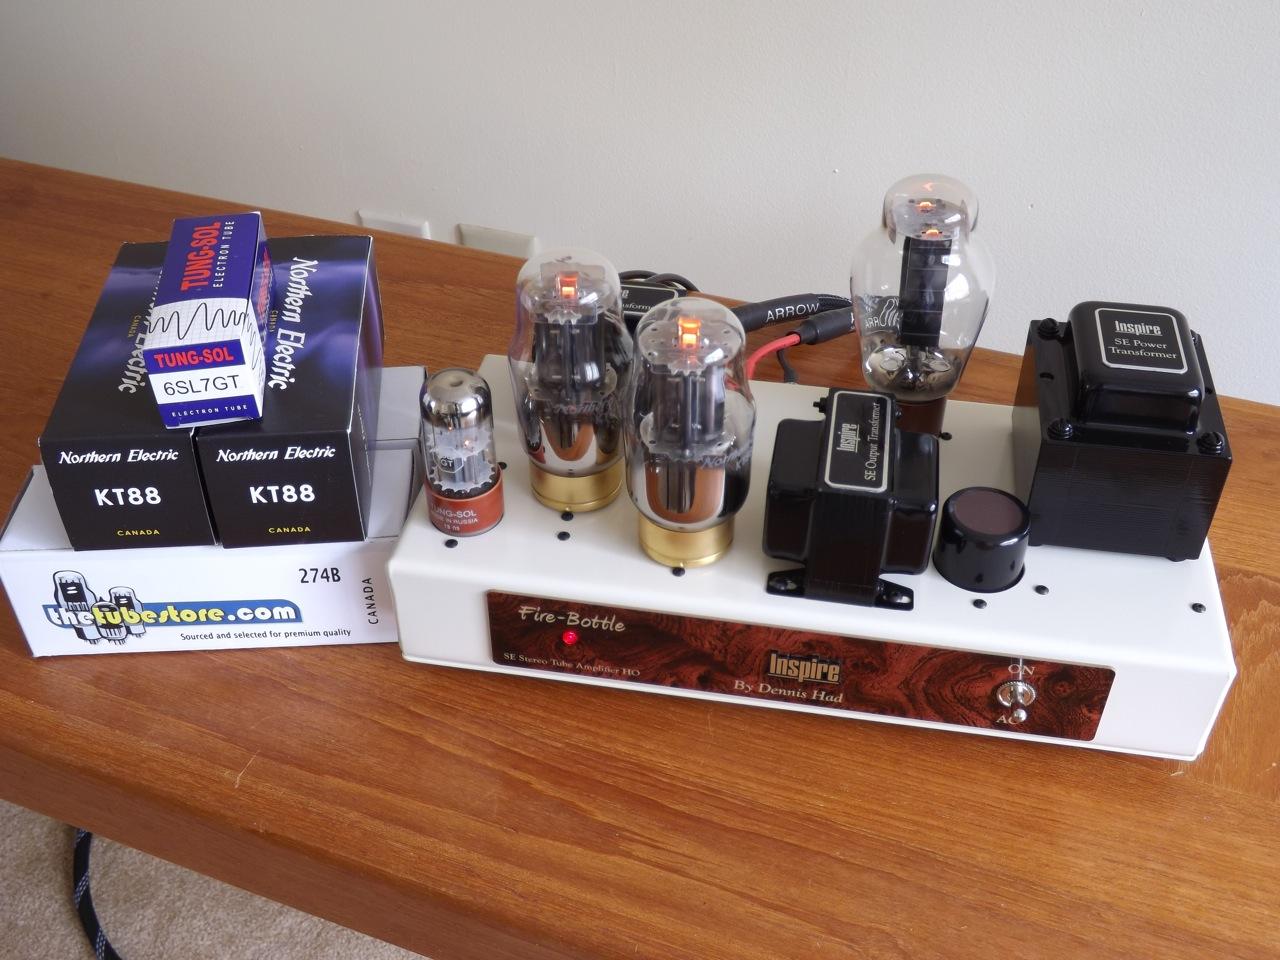 Dennis-Had-Inspire-KT88-Amp-3/ Northern Electric KT88 tubes